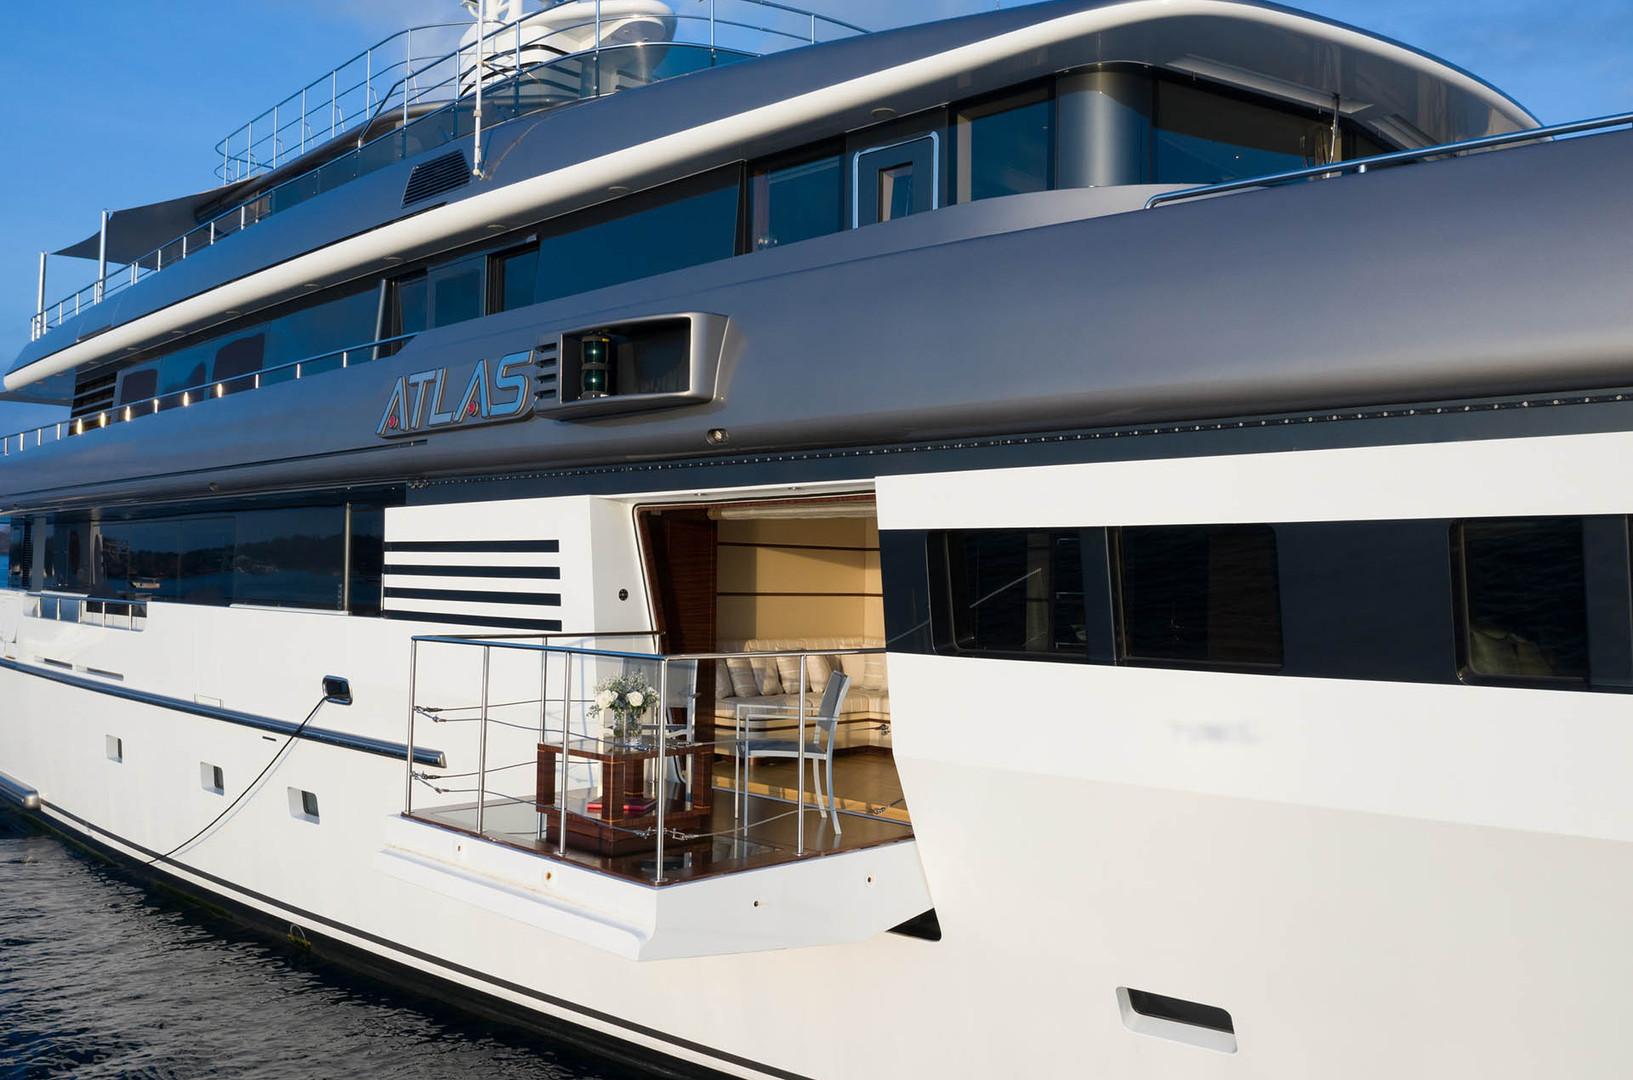 Yacht ATLAS - master suite balcony